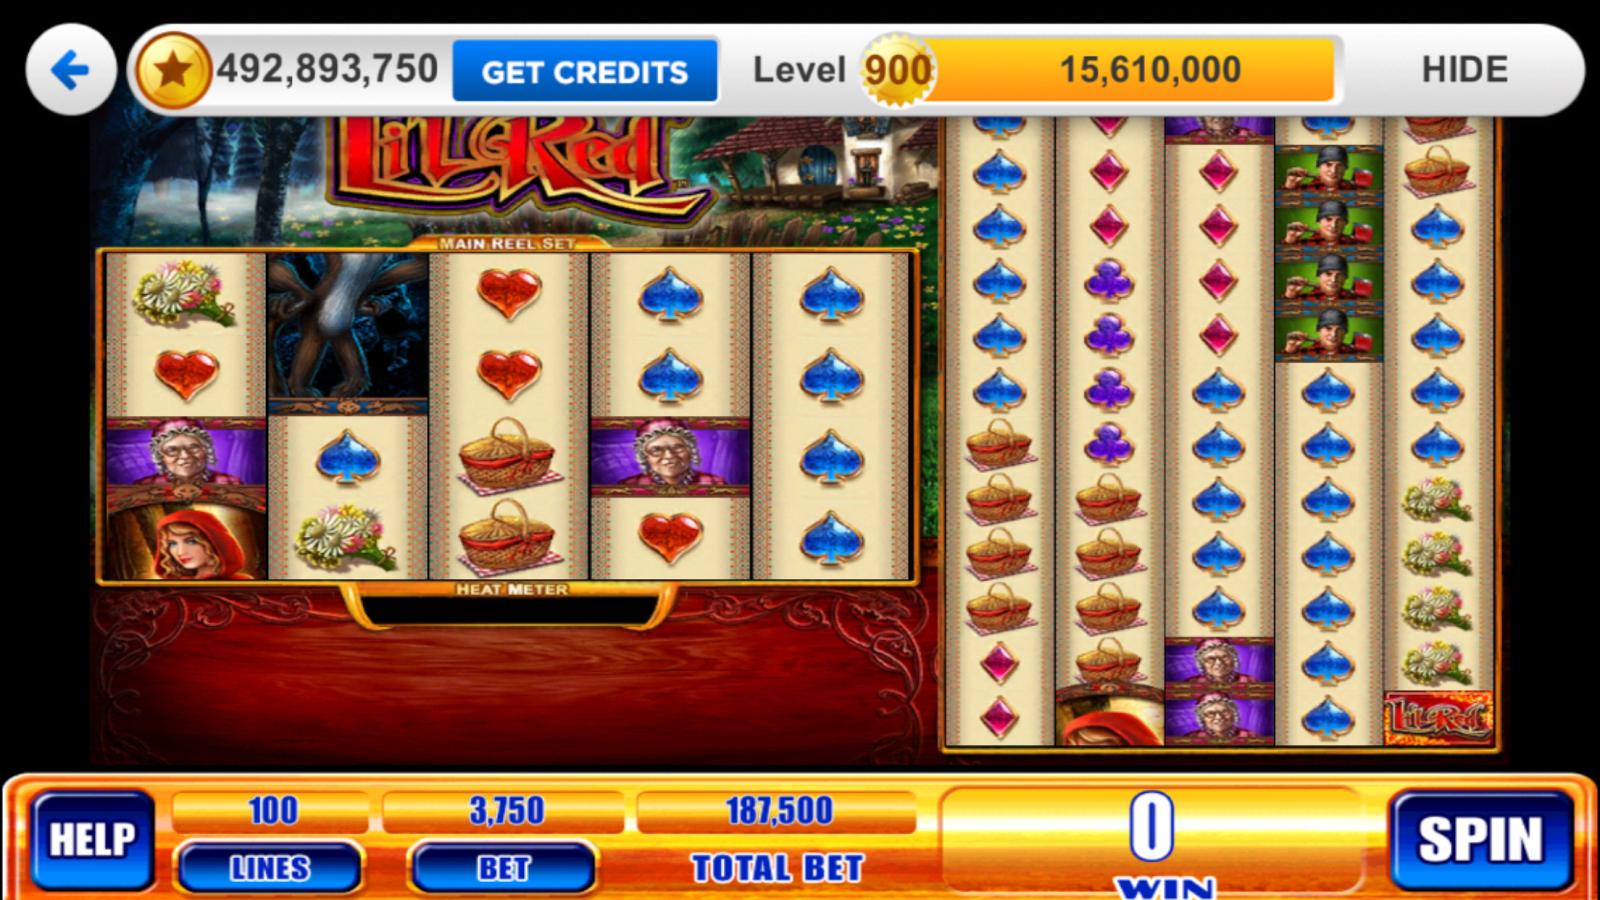 mohegan sun online casino app